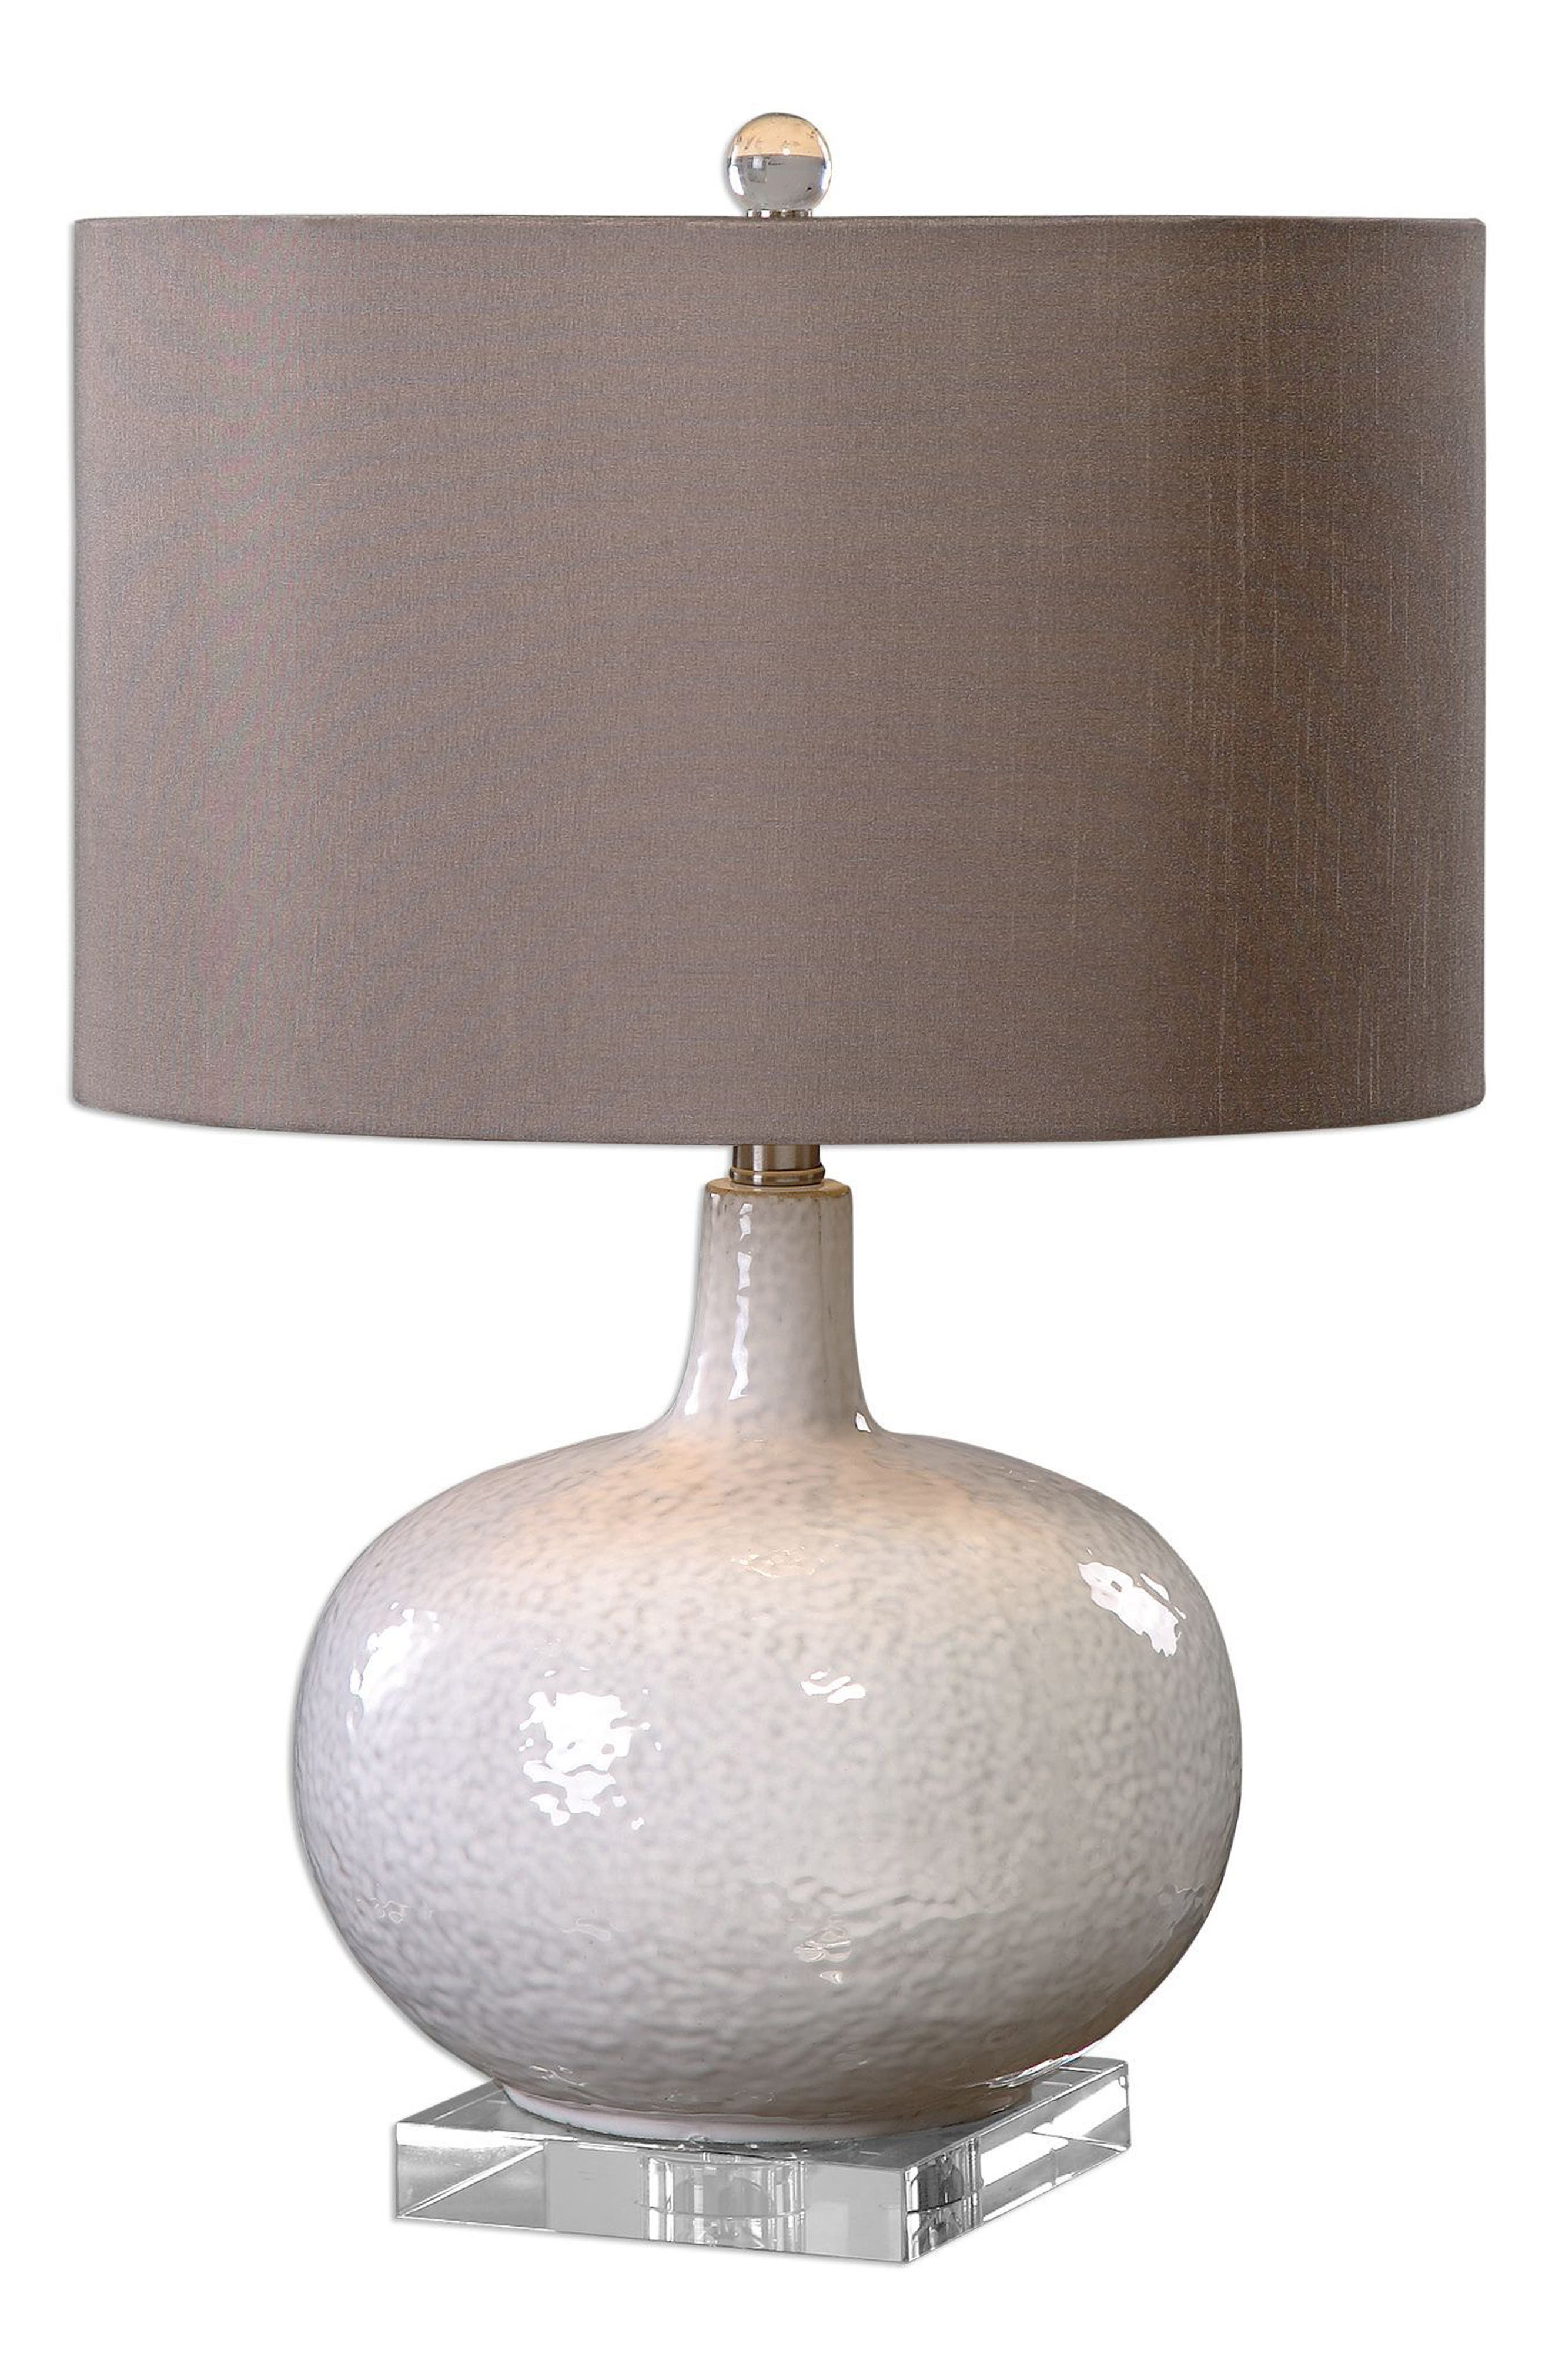 Parvati Table Lamp,                         Main,                         color, White